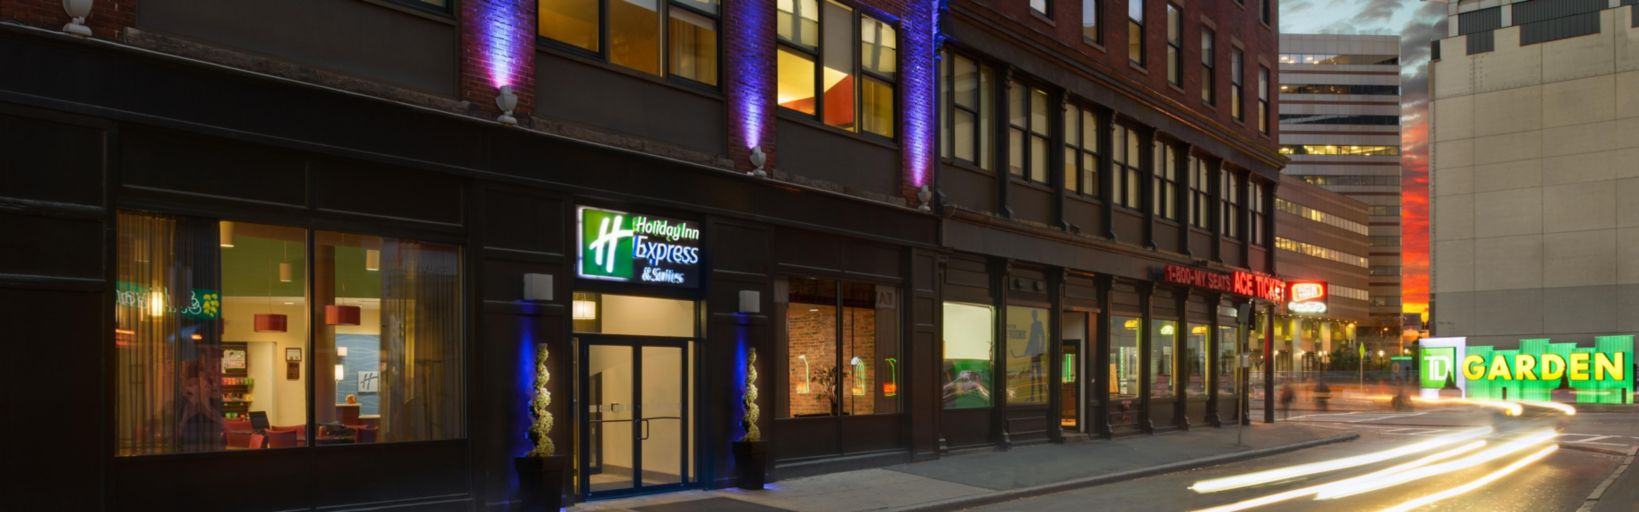 Holiday Inn Express & Suites Boston Garden - Bostonのホテルを予約